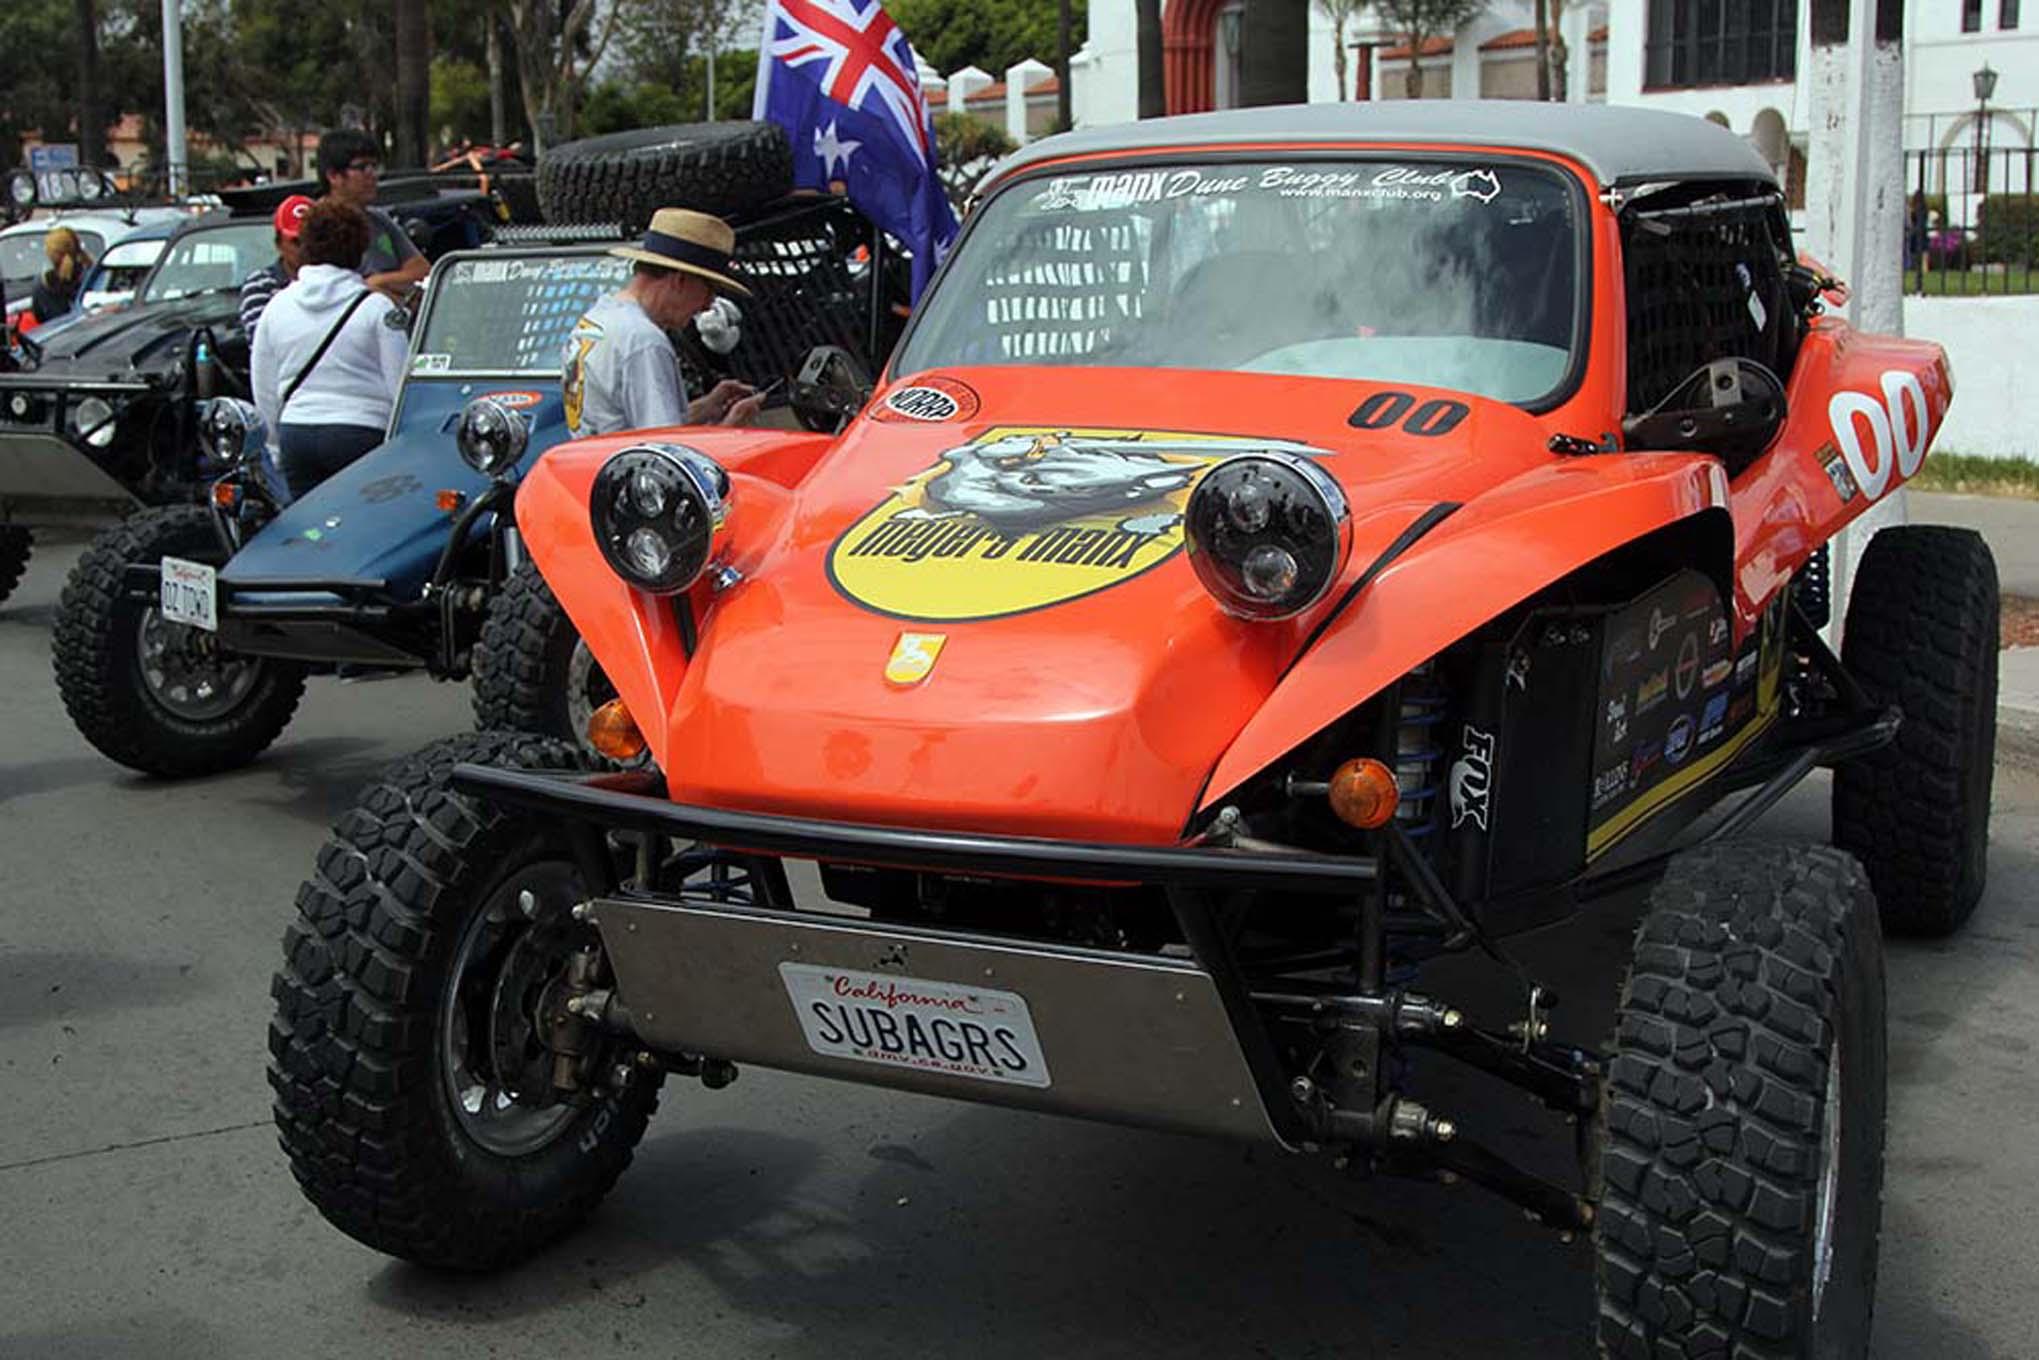 093NORRA Mexican 1000 BAJA offroad Race 2015 Manx Nova Chevy James Garner